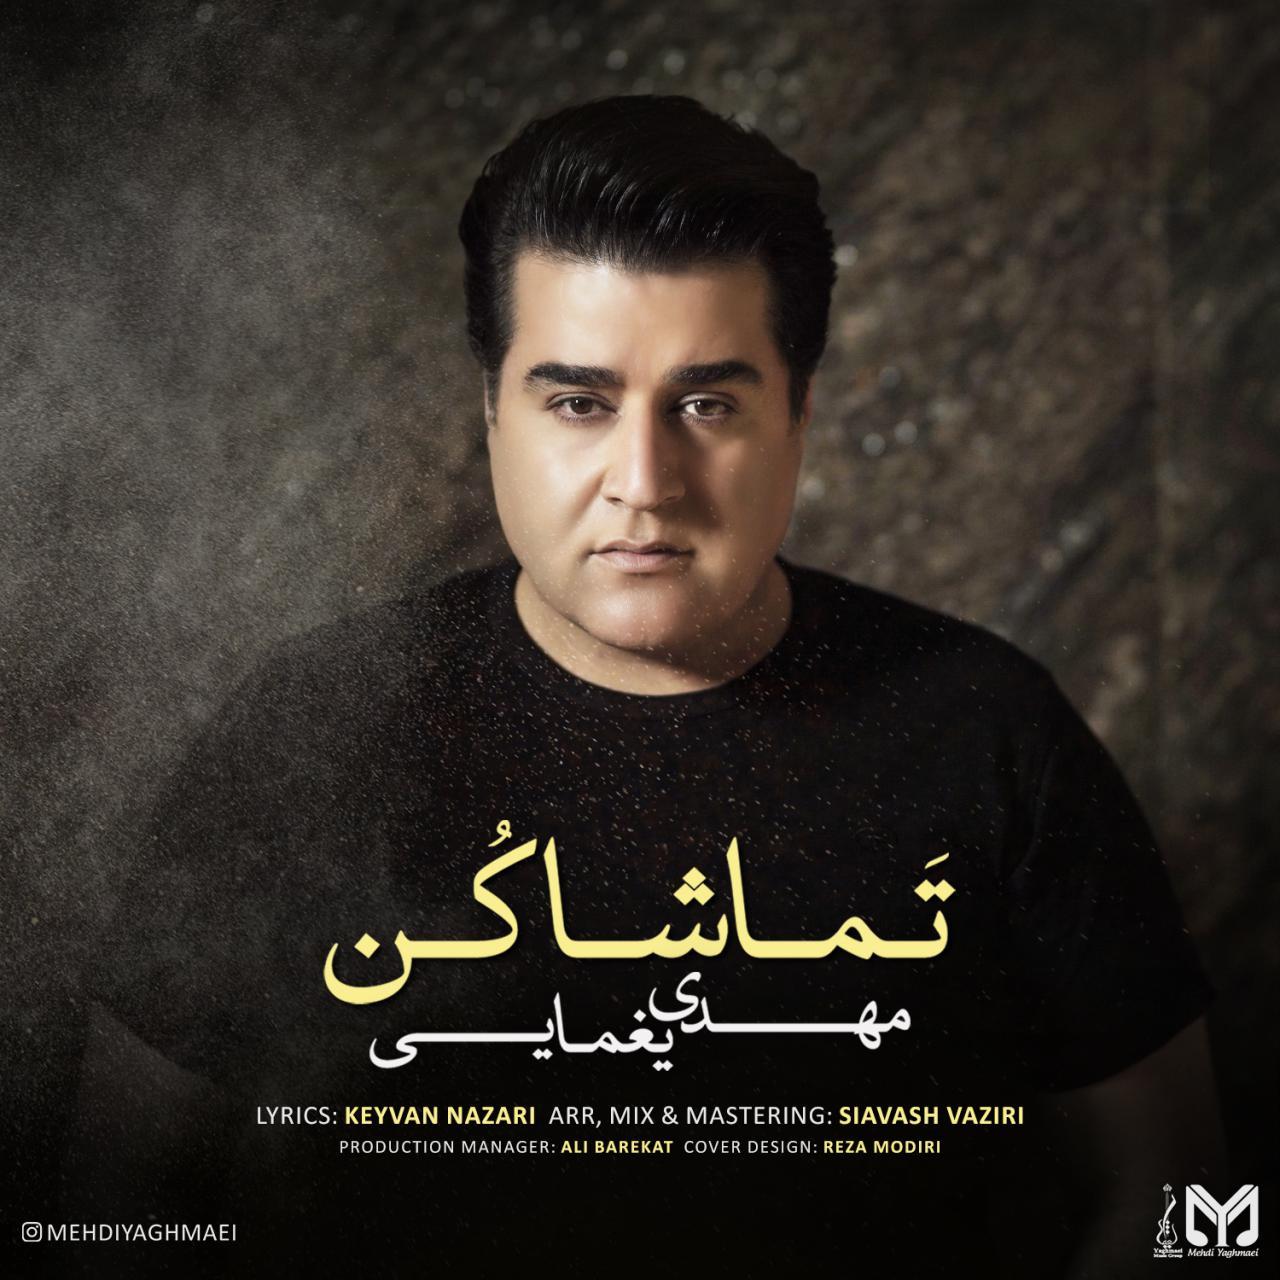 https://www.ganja2music.com/Image/Post/10.2019/Mehdi%20Yaghmaei%20-%20Tamasha%20Kon.jpg